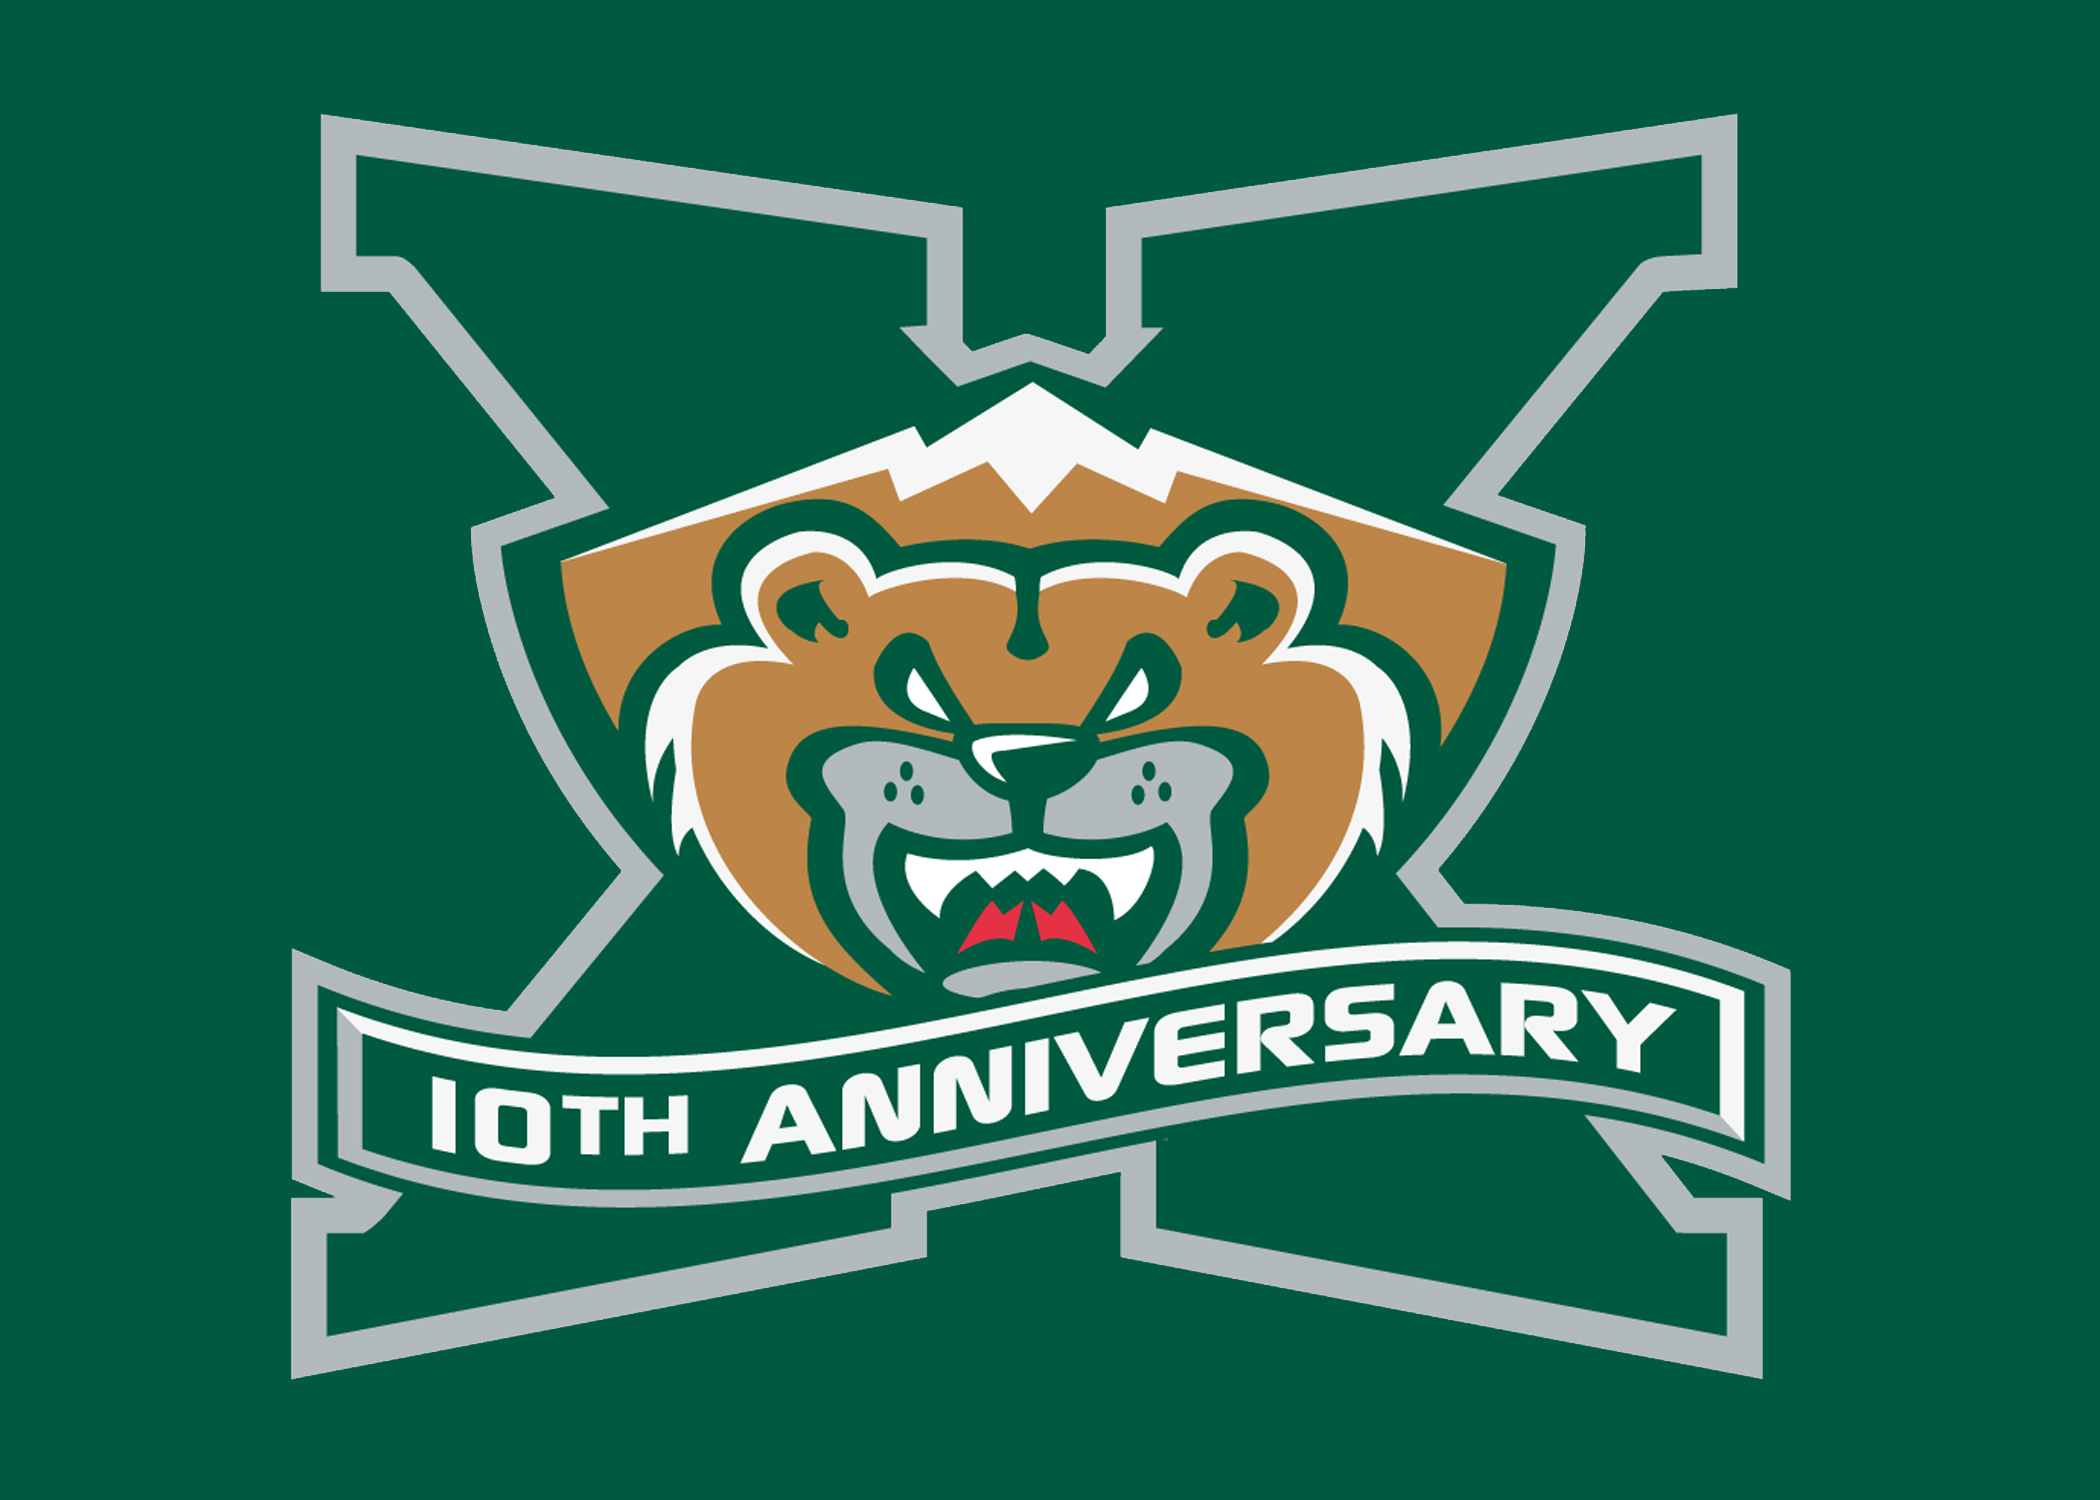 10th anniversary Logos